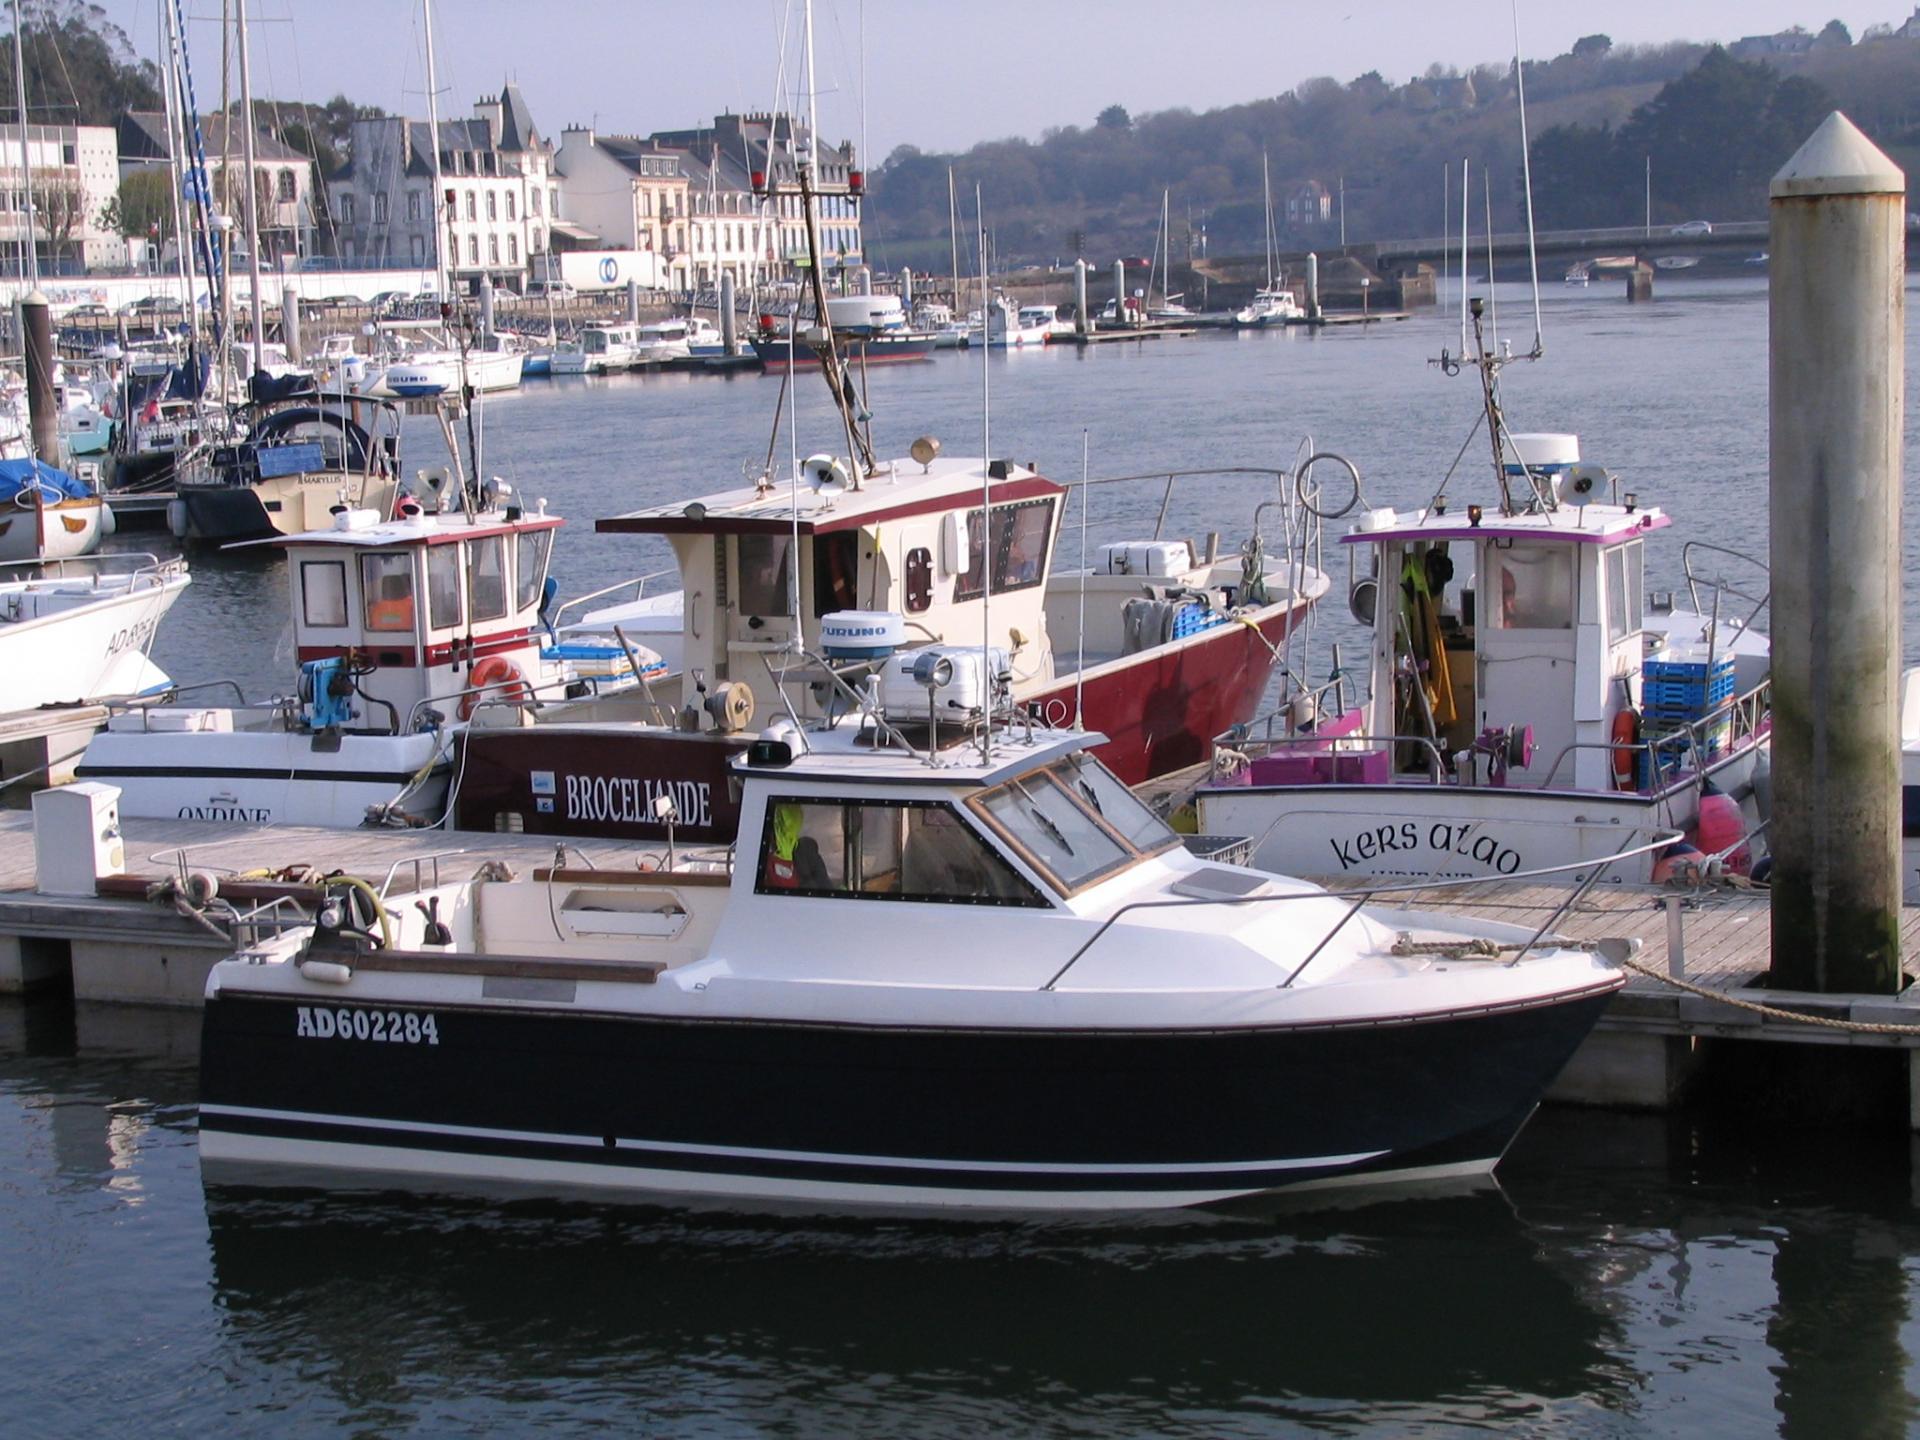 200328 malpica ponton b